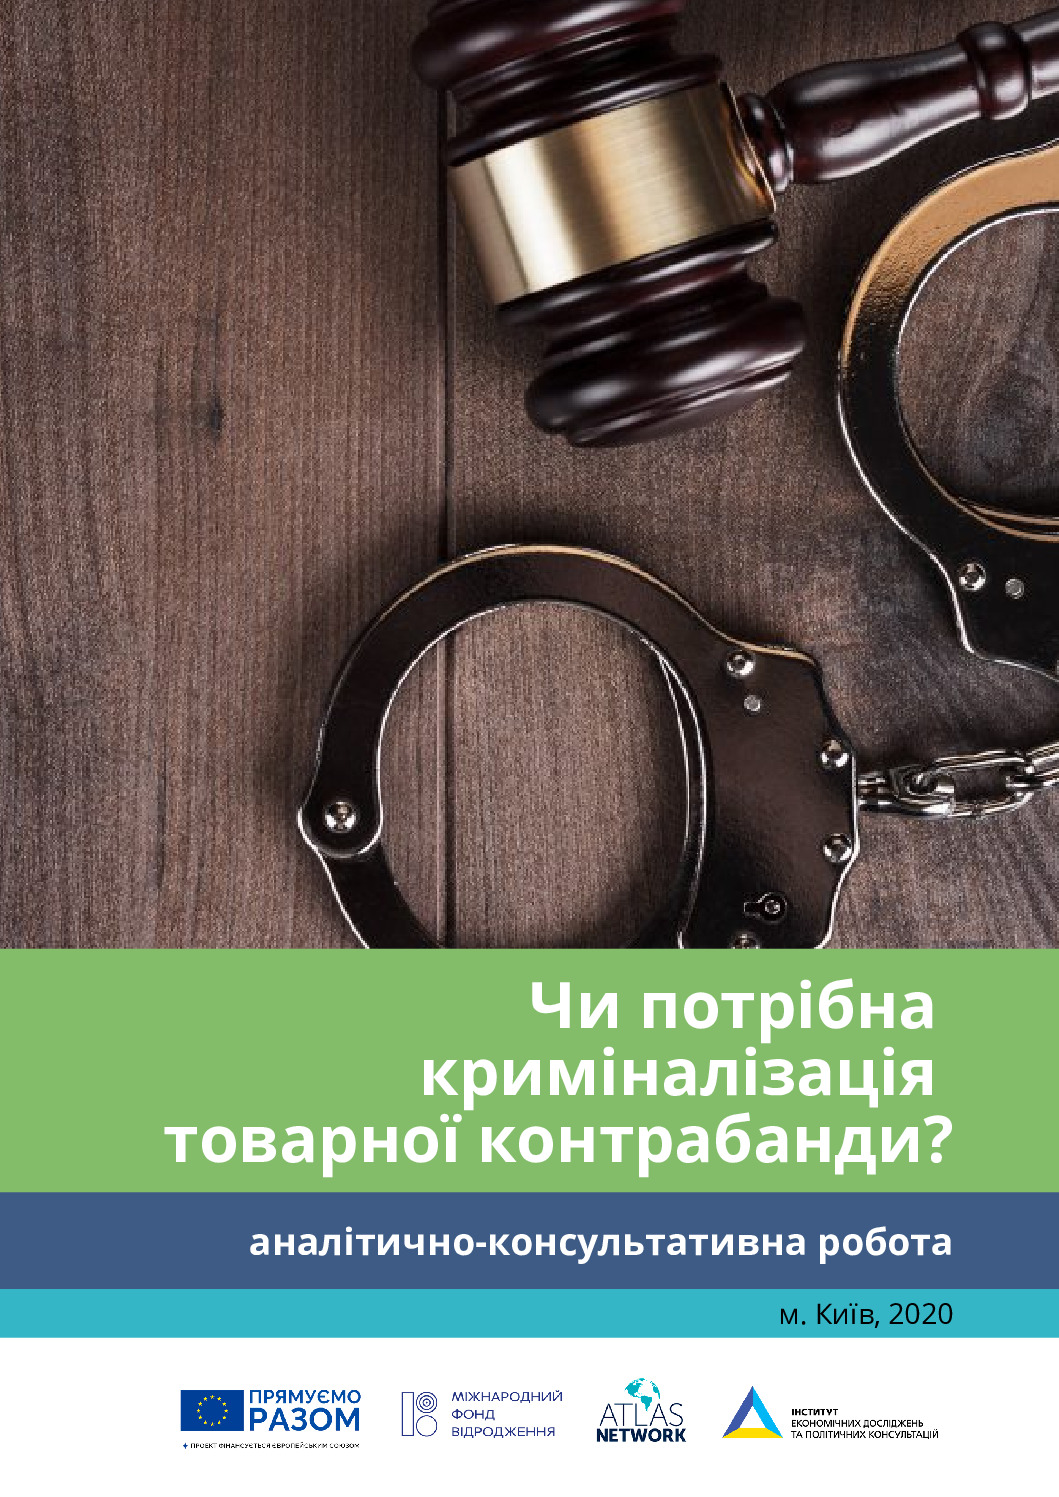 thumbnail of РР_Кримінал_товарн контраб_final